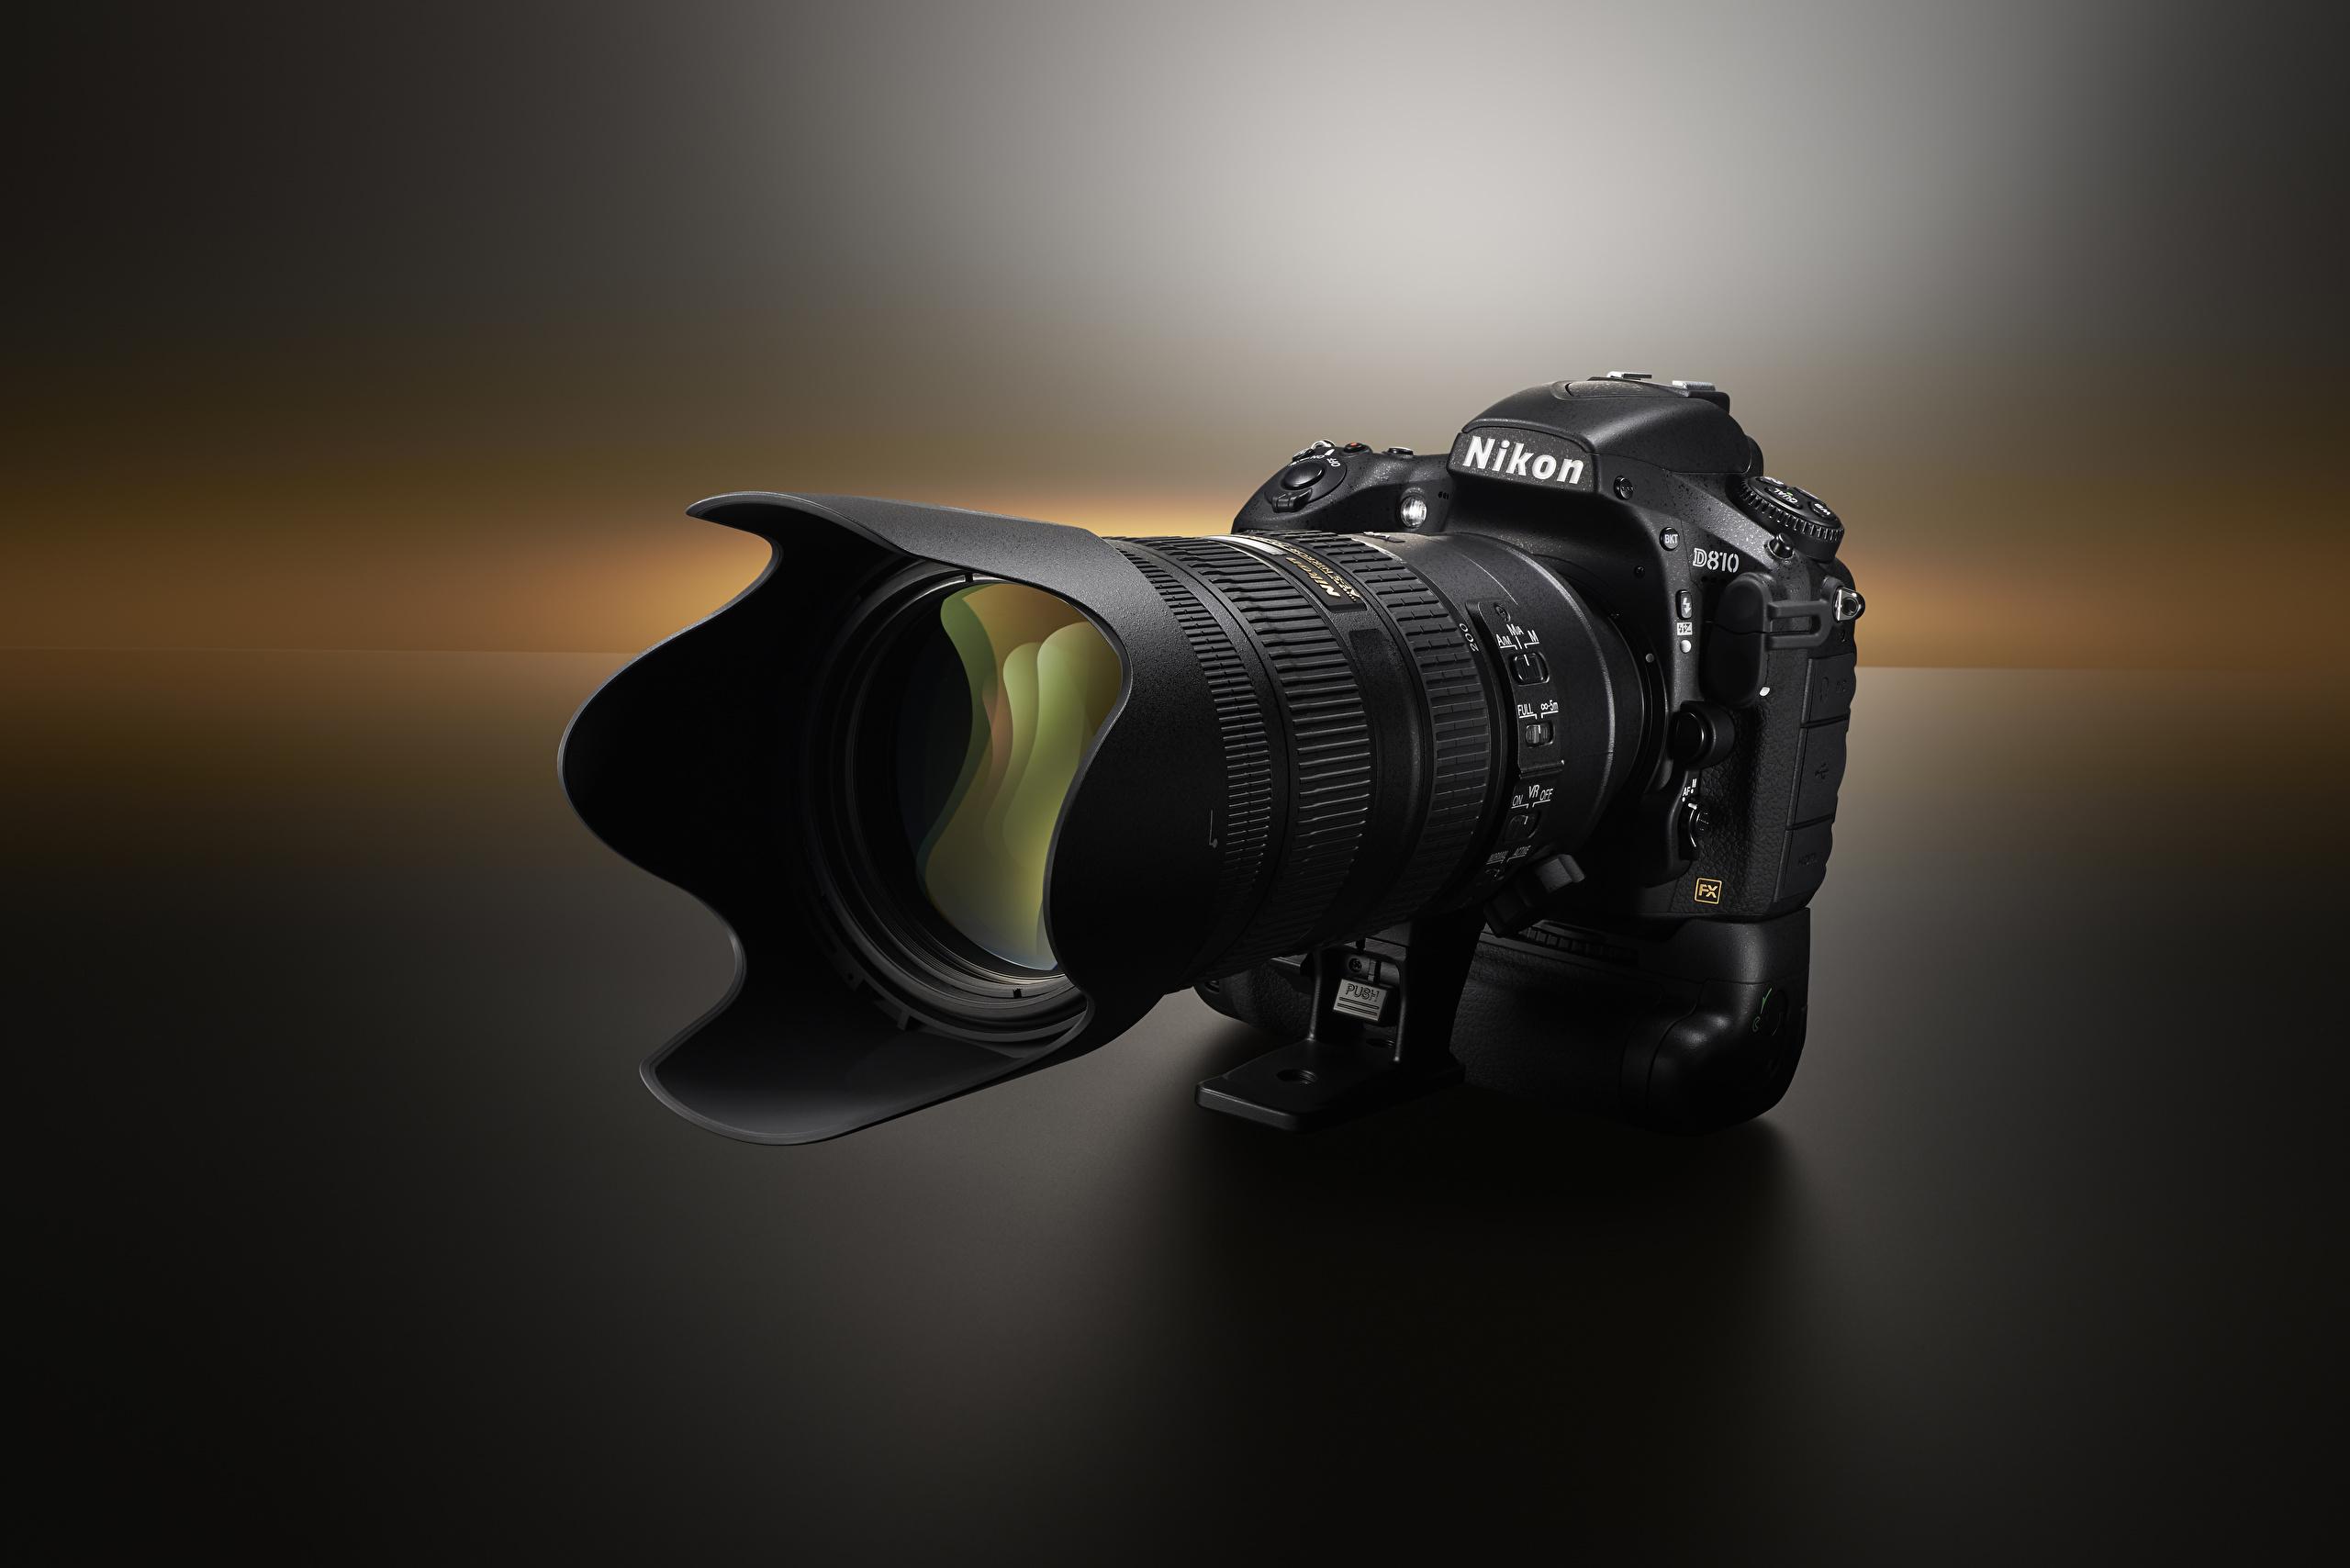 Фотоаппарат Nikon старый  № 3624446 бесплатно